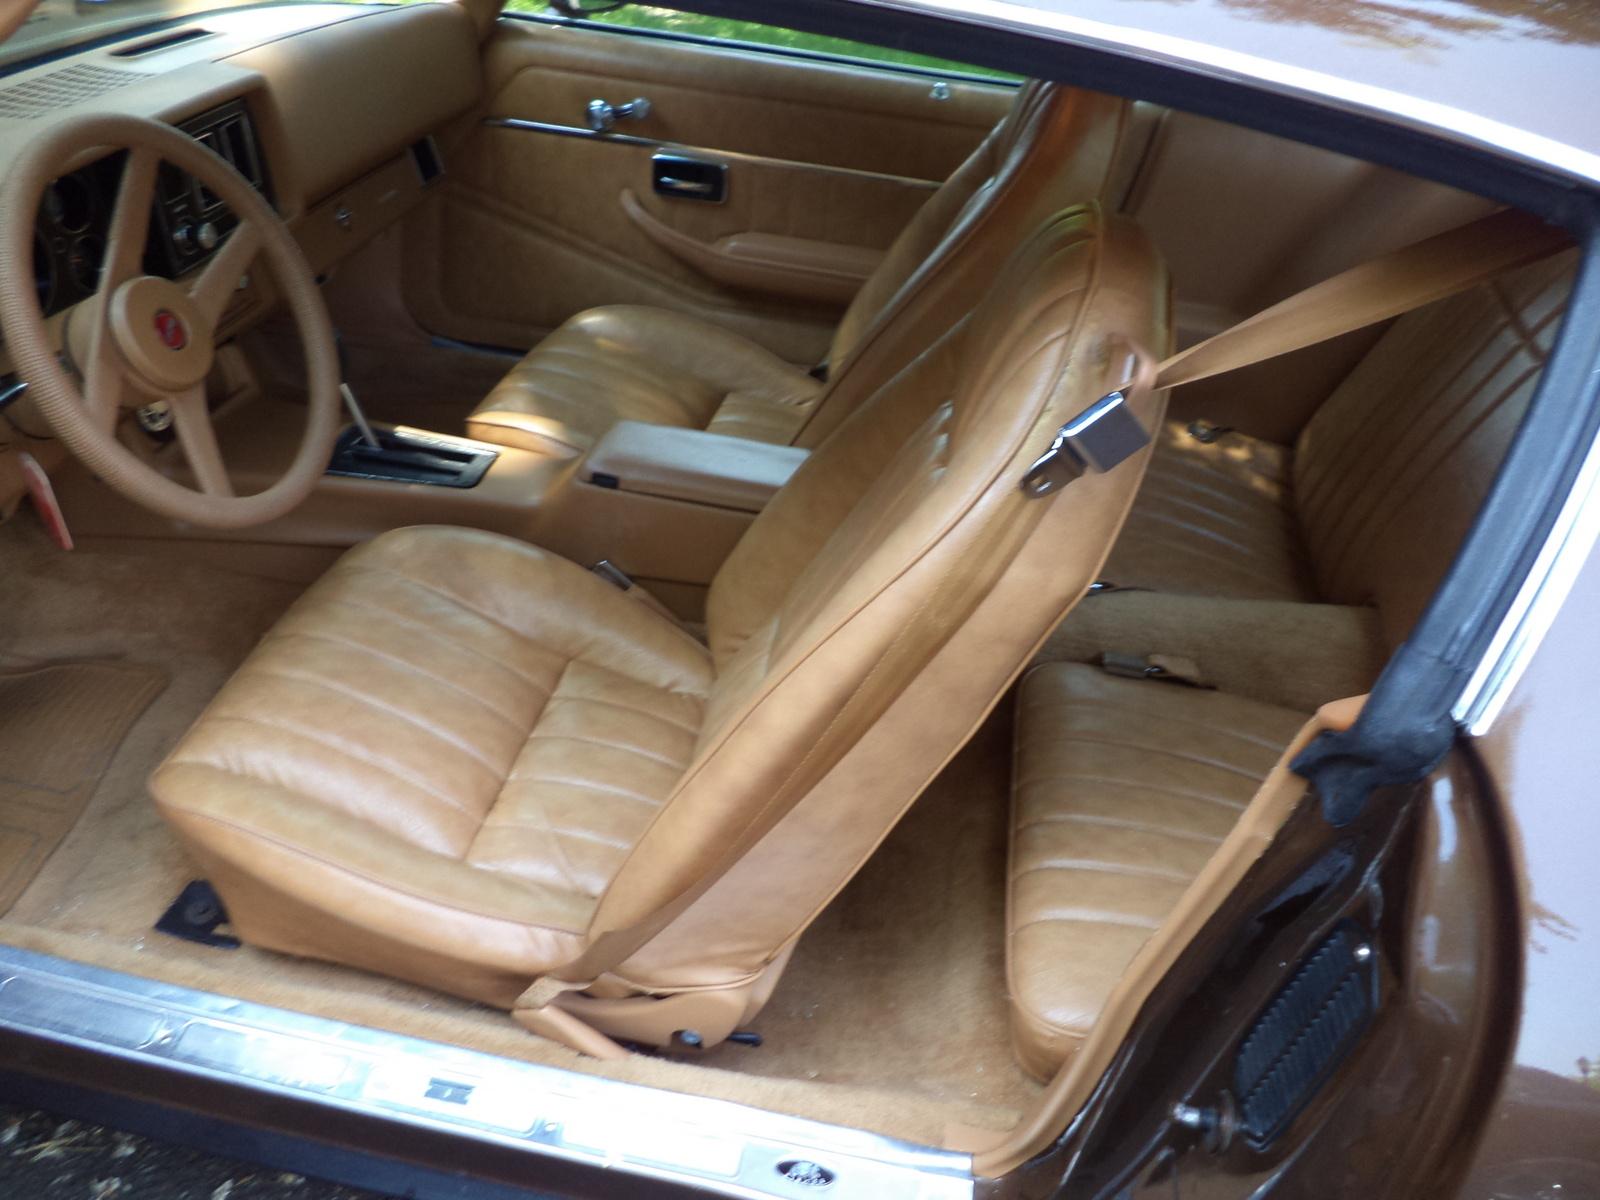 1979 Camaro Z28 Update 5 Headliner In Dash Painted Youtube